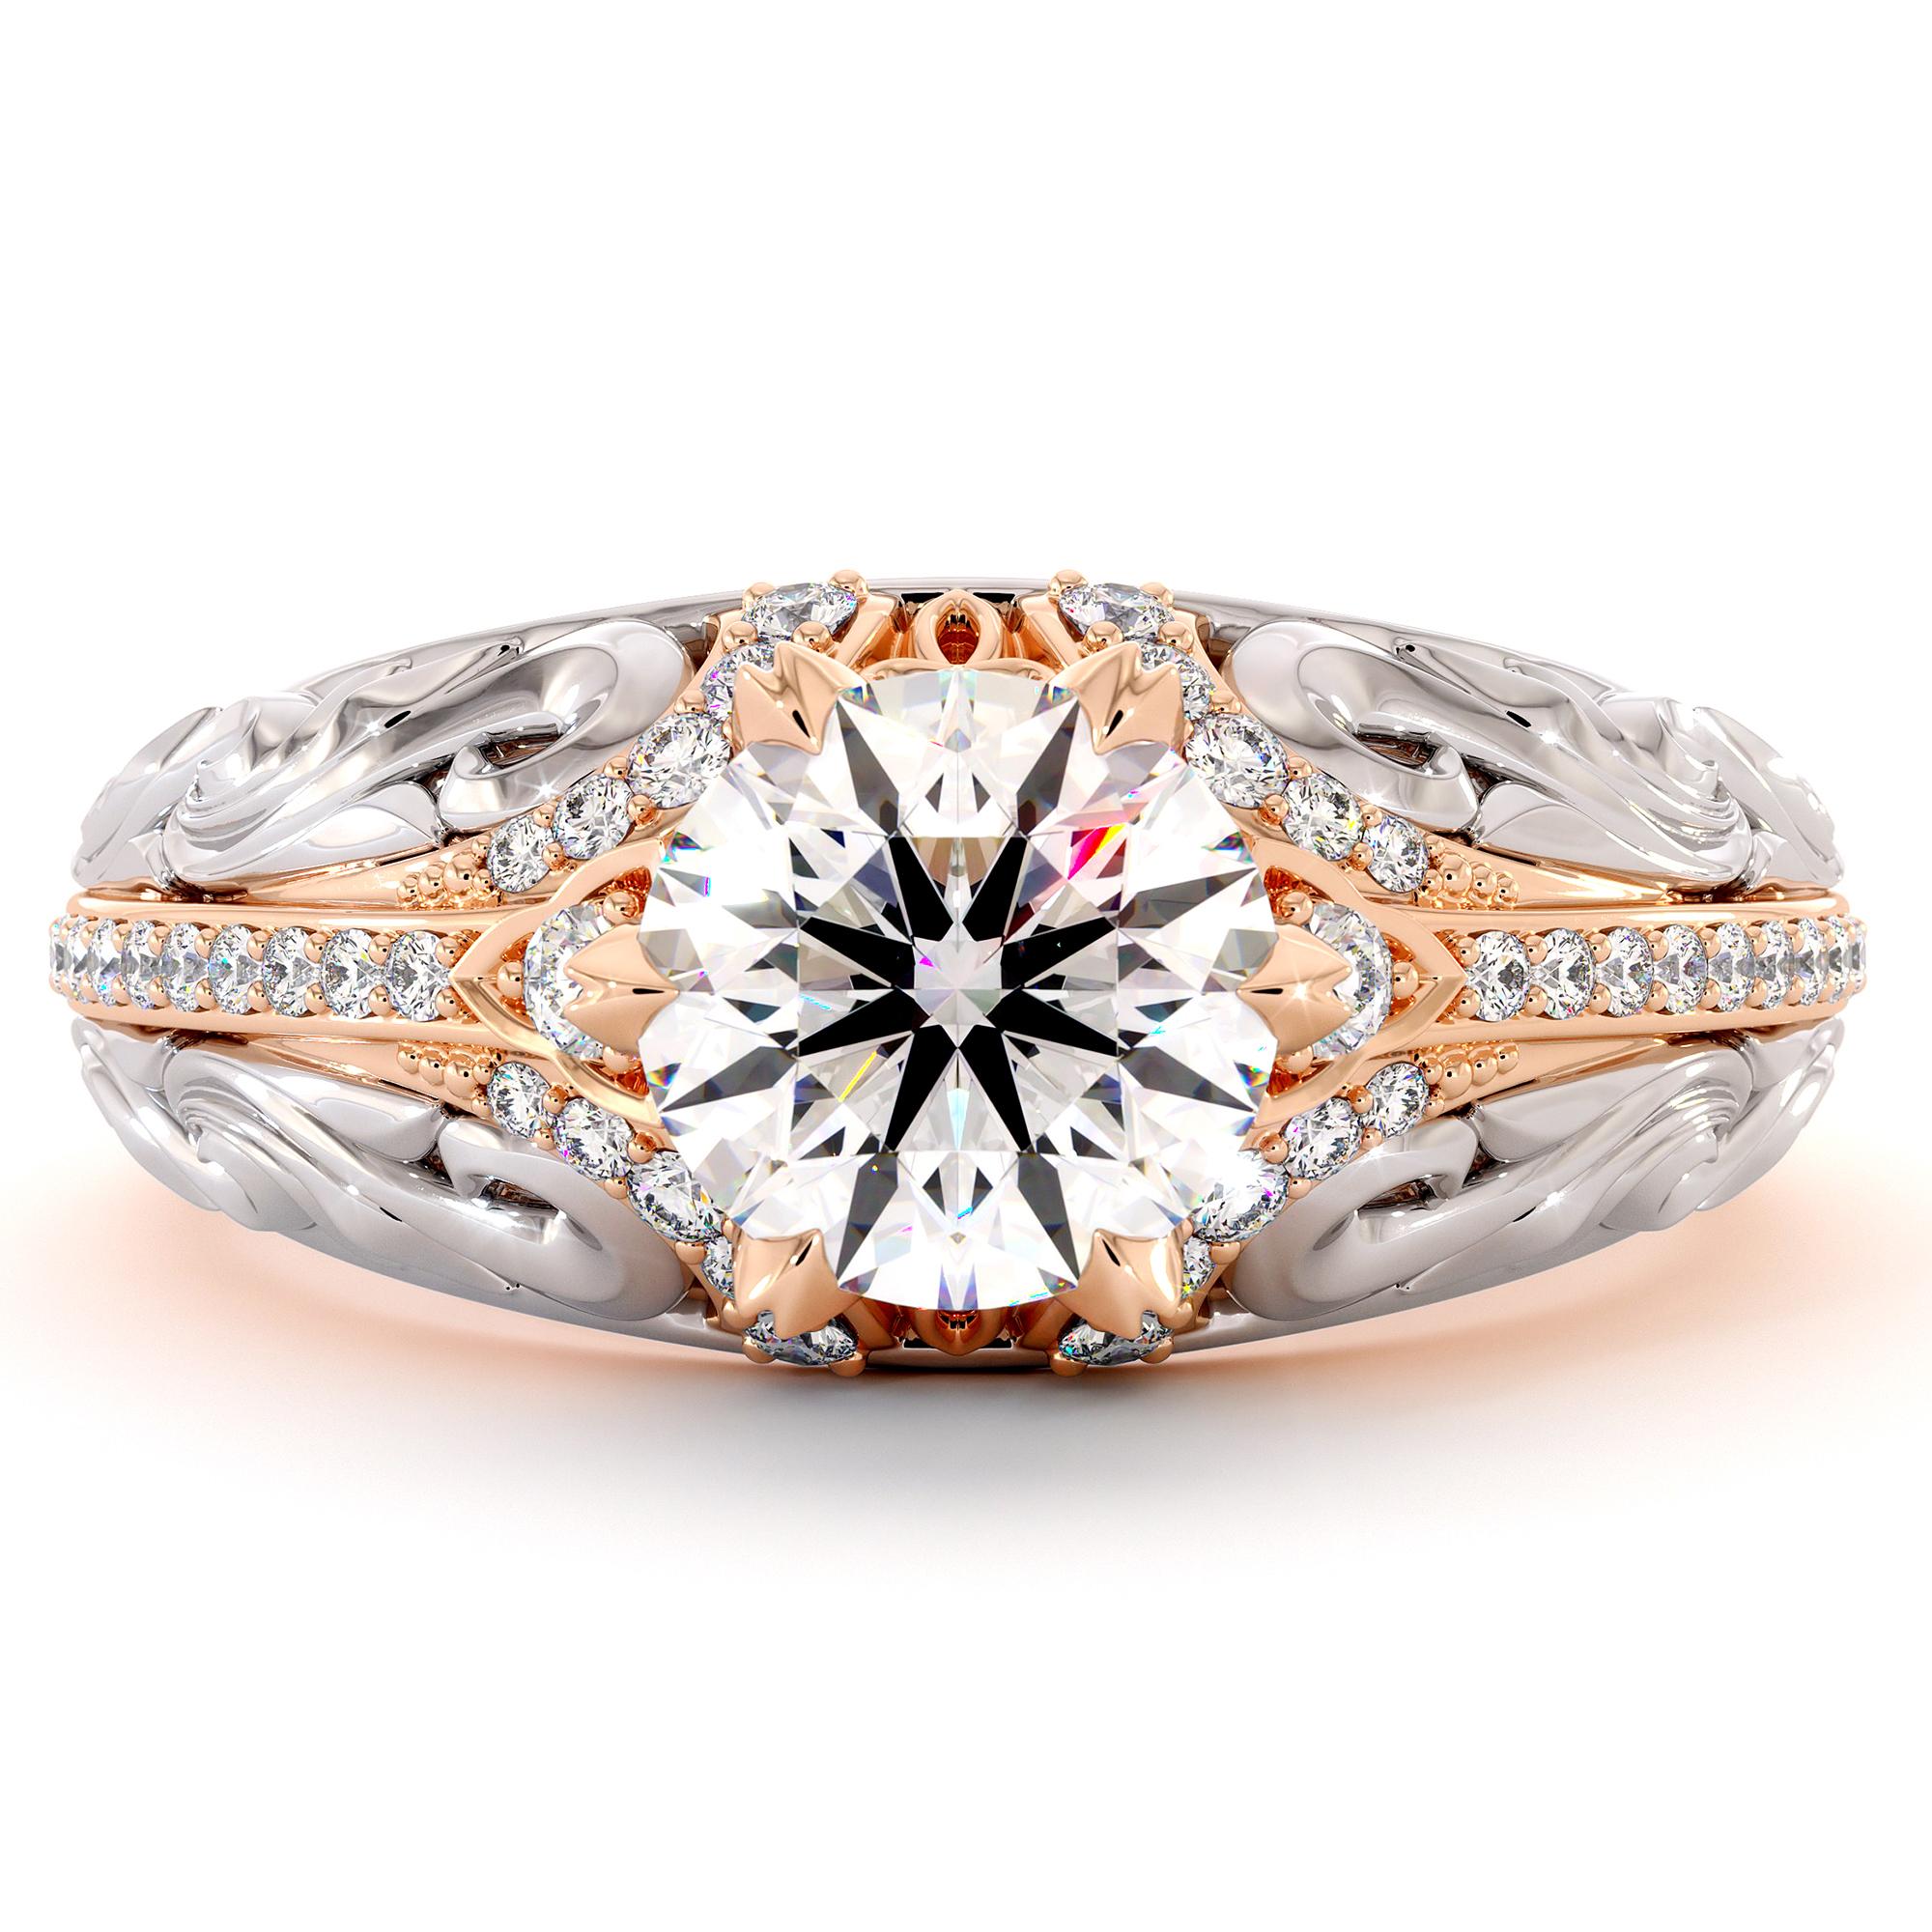 Stunning Moissanite Two Tone Gold Engagement Regal Ring